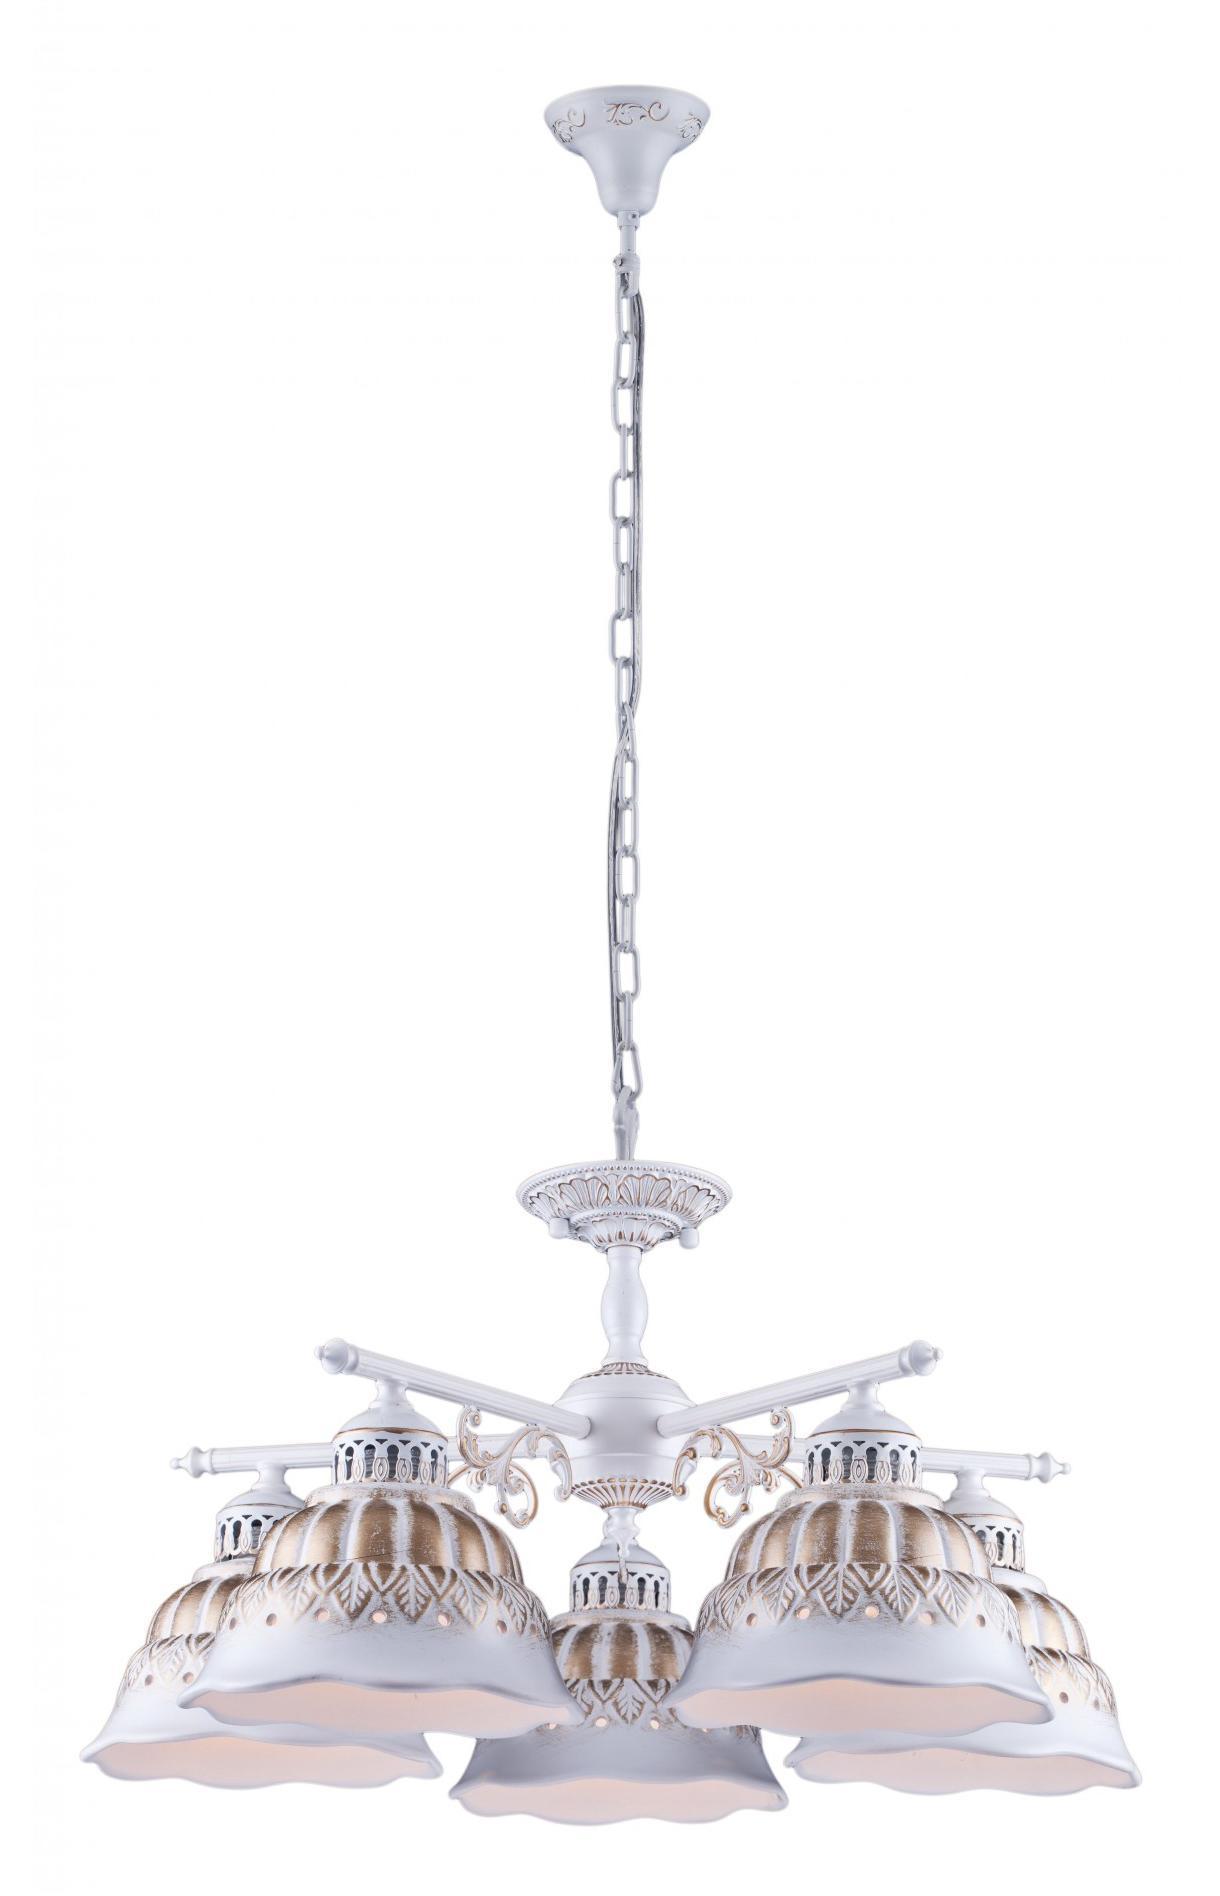 Люстра Arte lamp A2814lm-5wg подвесная люстра arte lamp chiesa a2814lm 5wg